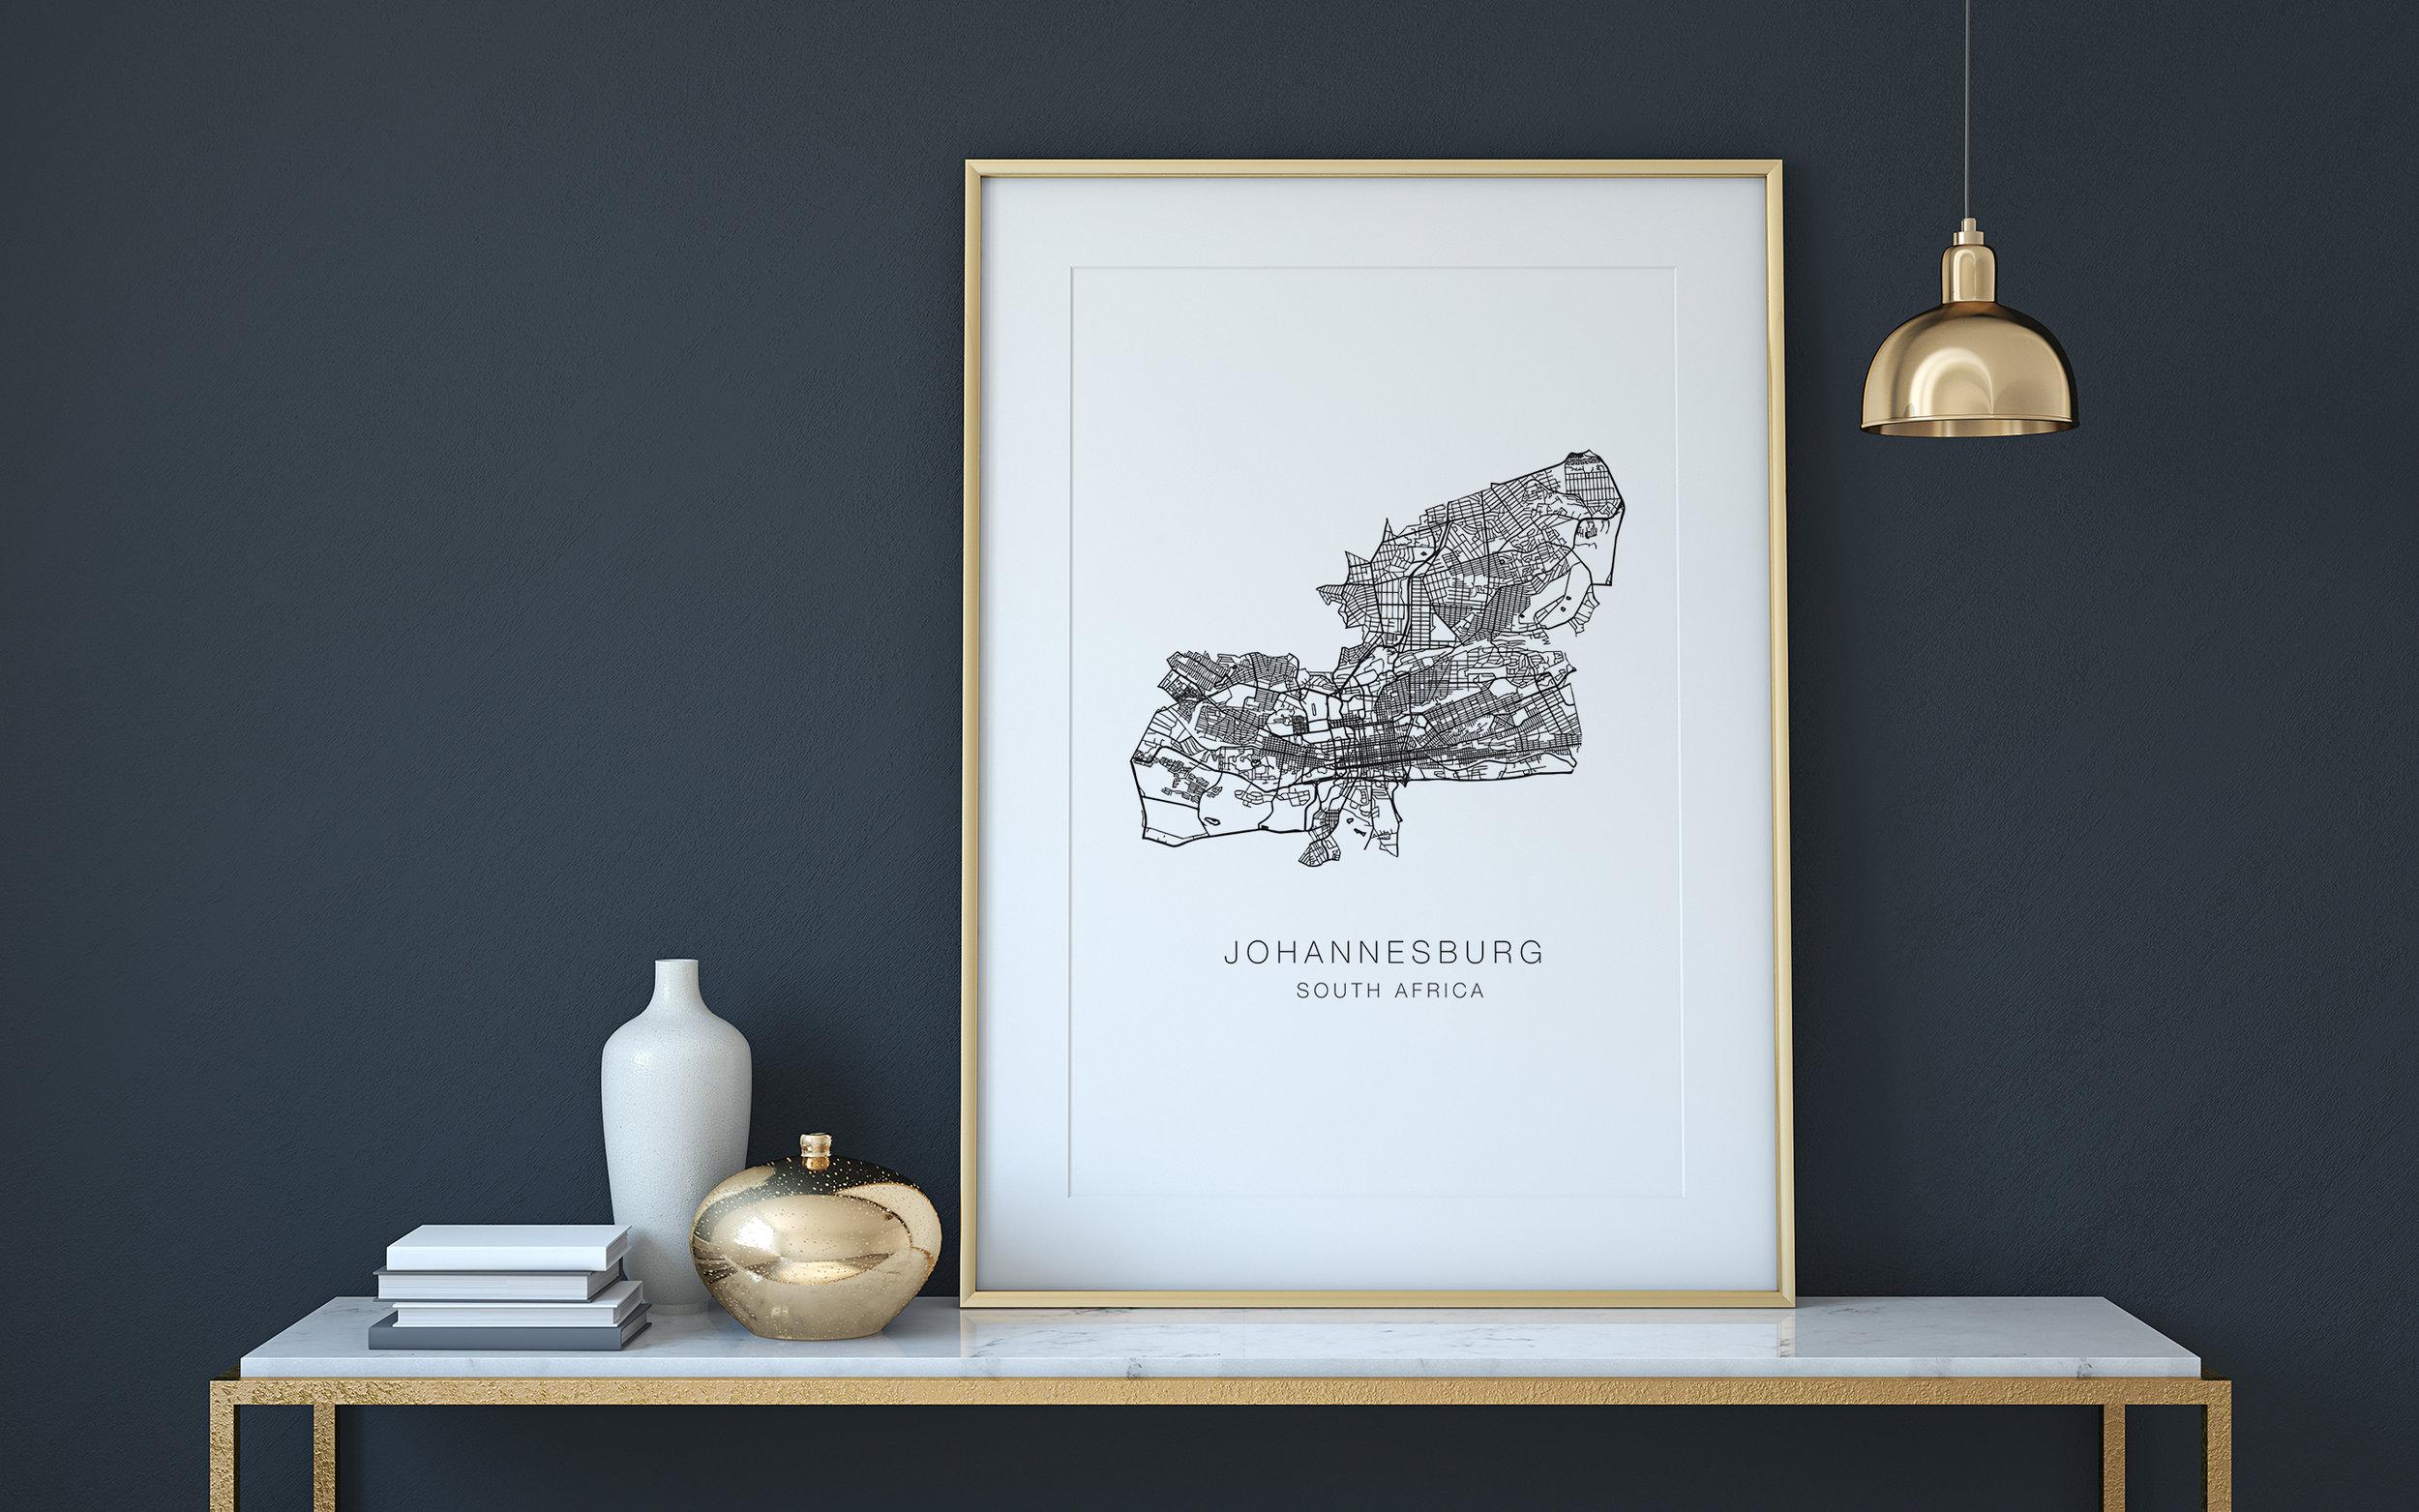 johannesburg1.jpg